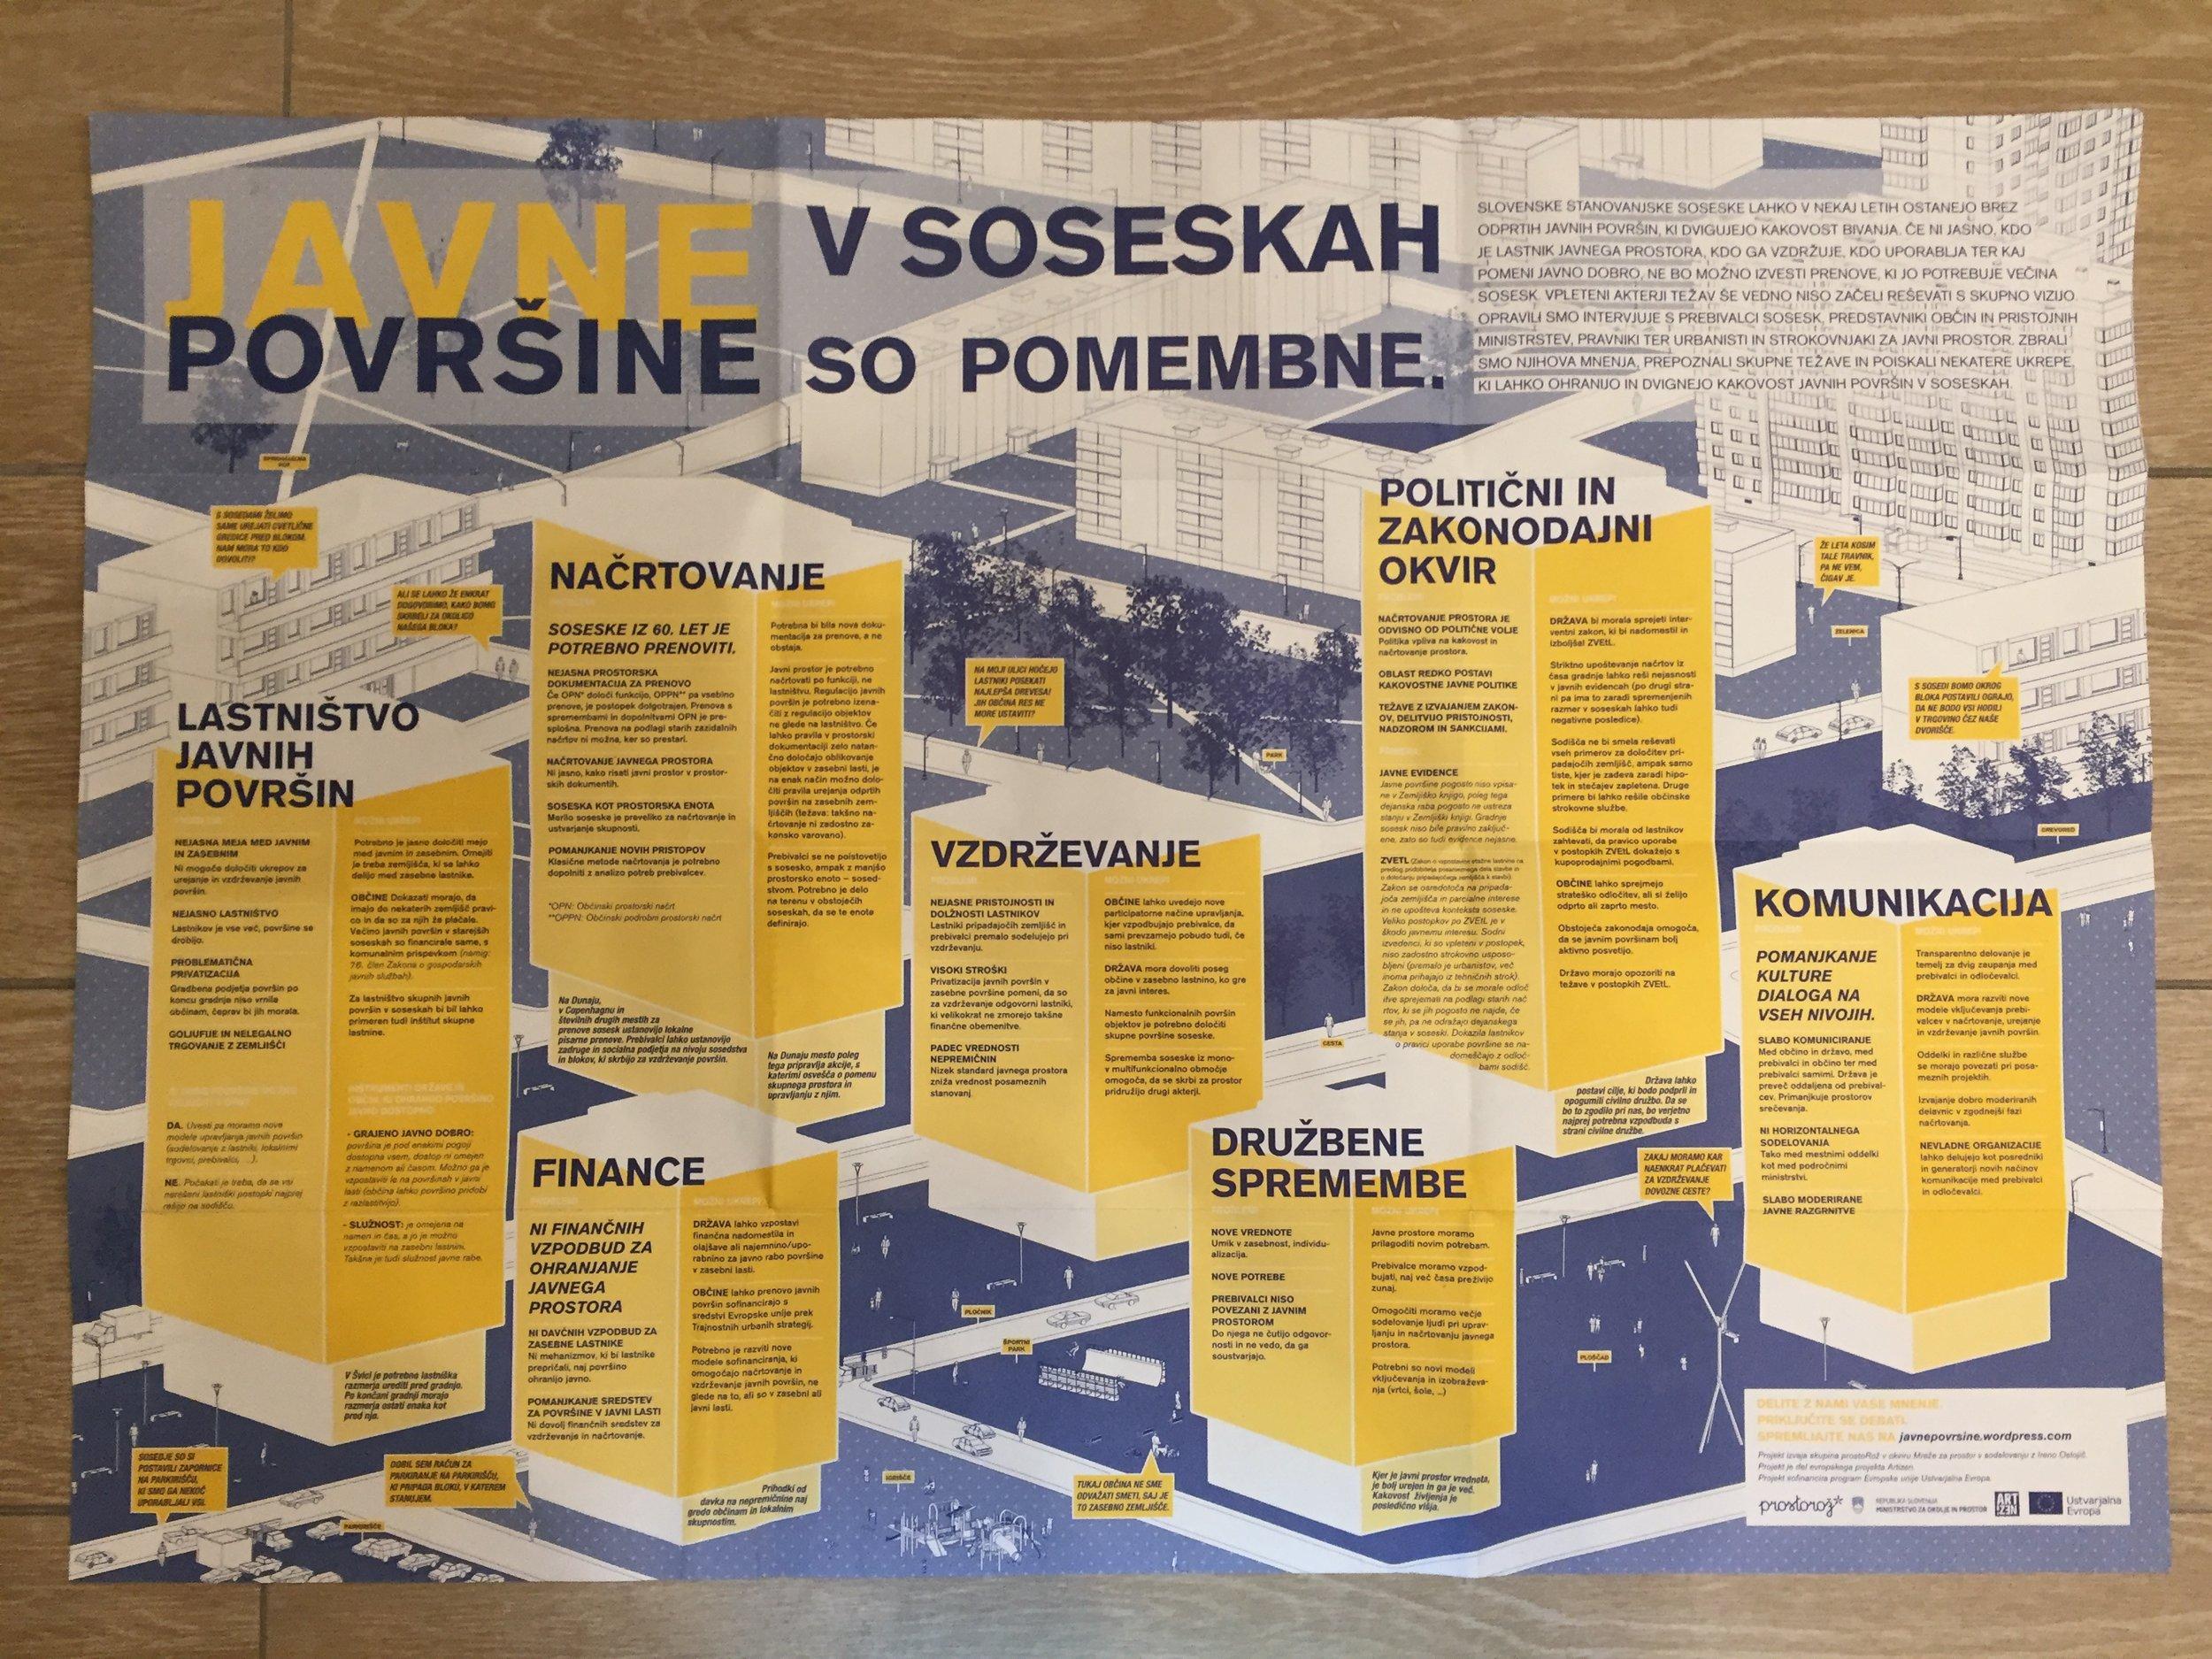 beautiful infographic for the Javne Površine project